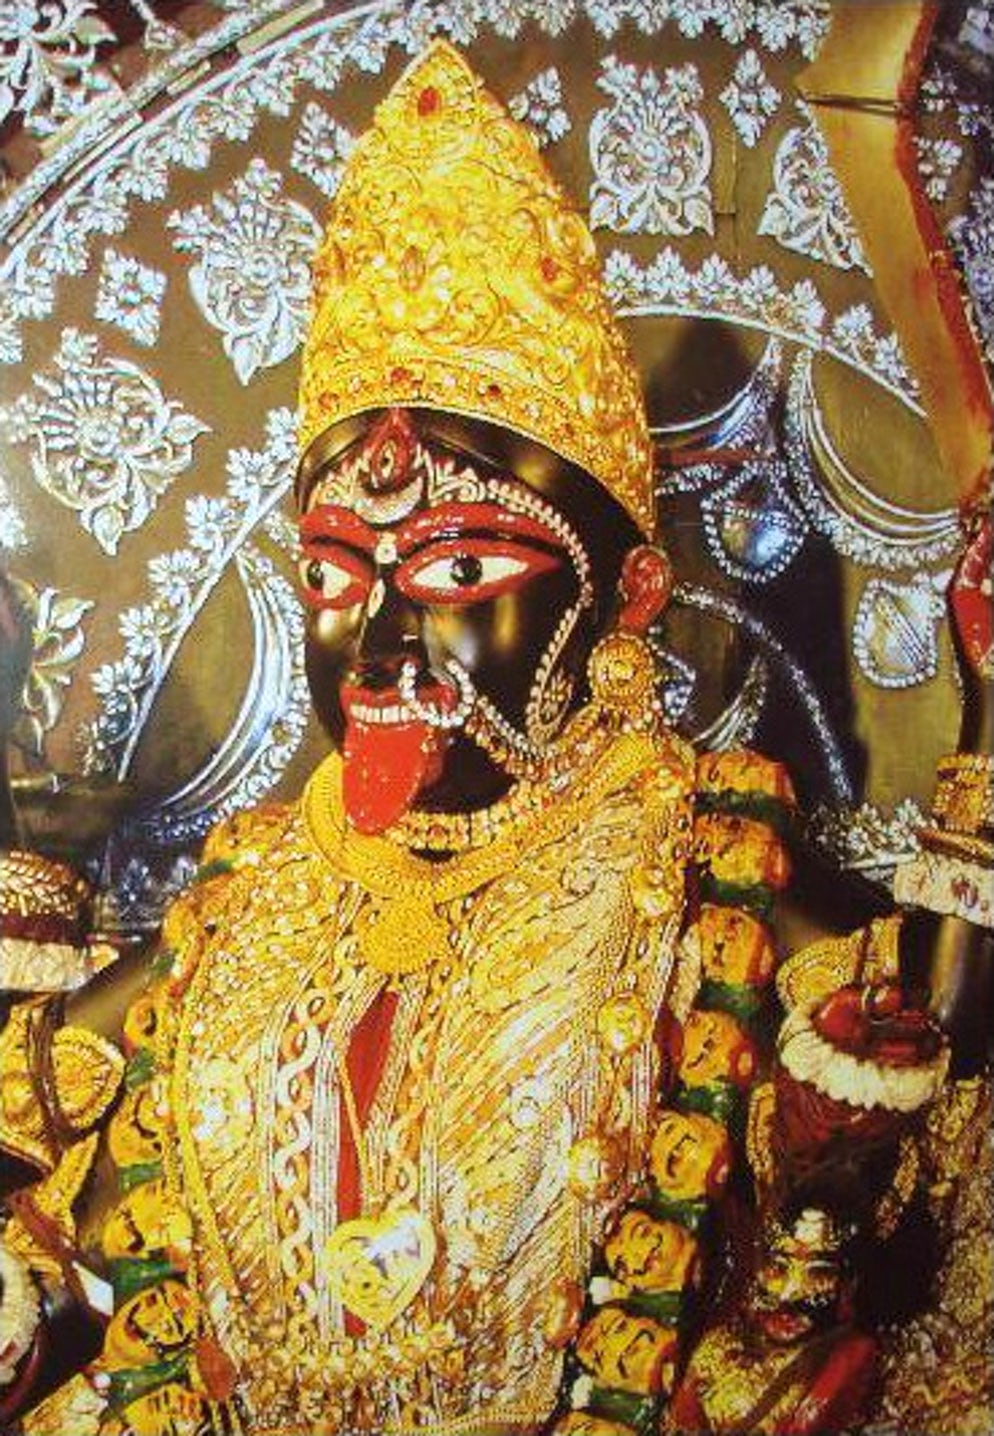 © Wikimedia Commons/ Jagadhatri